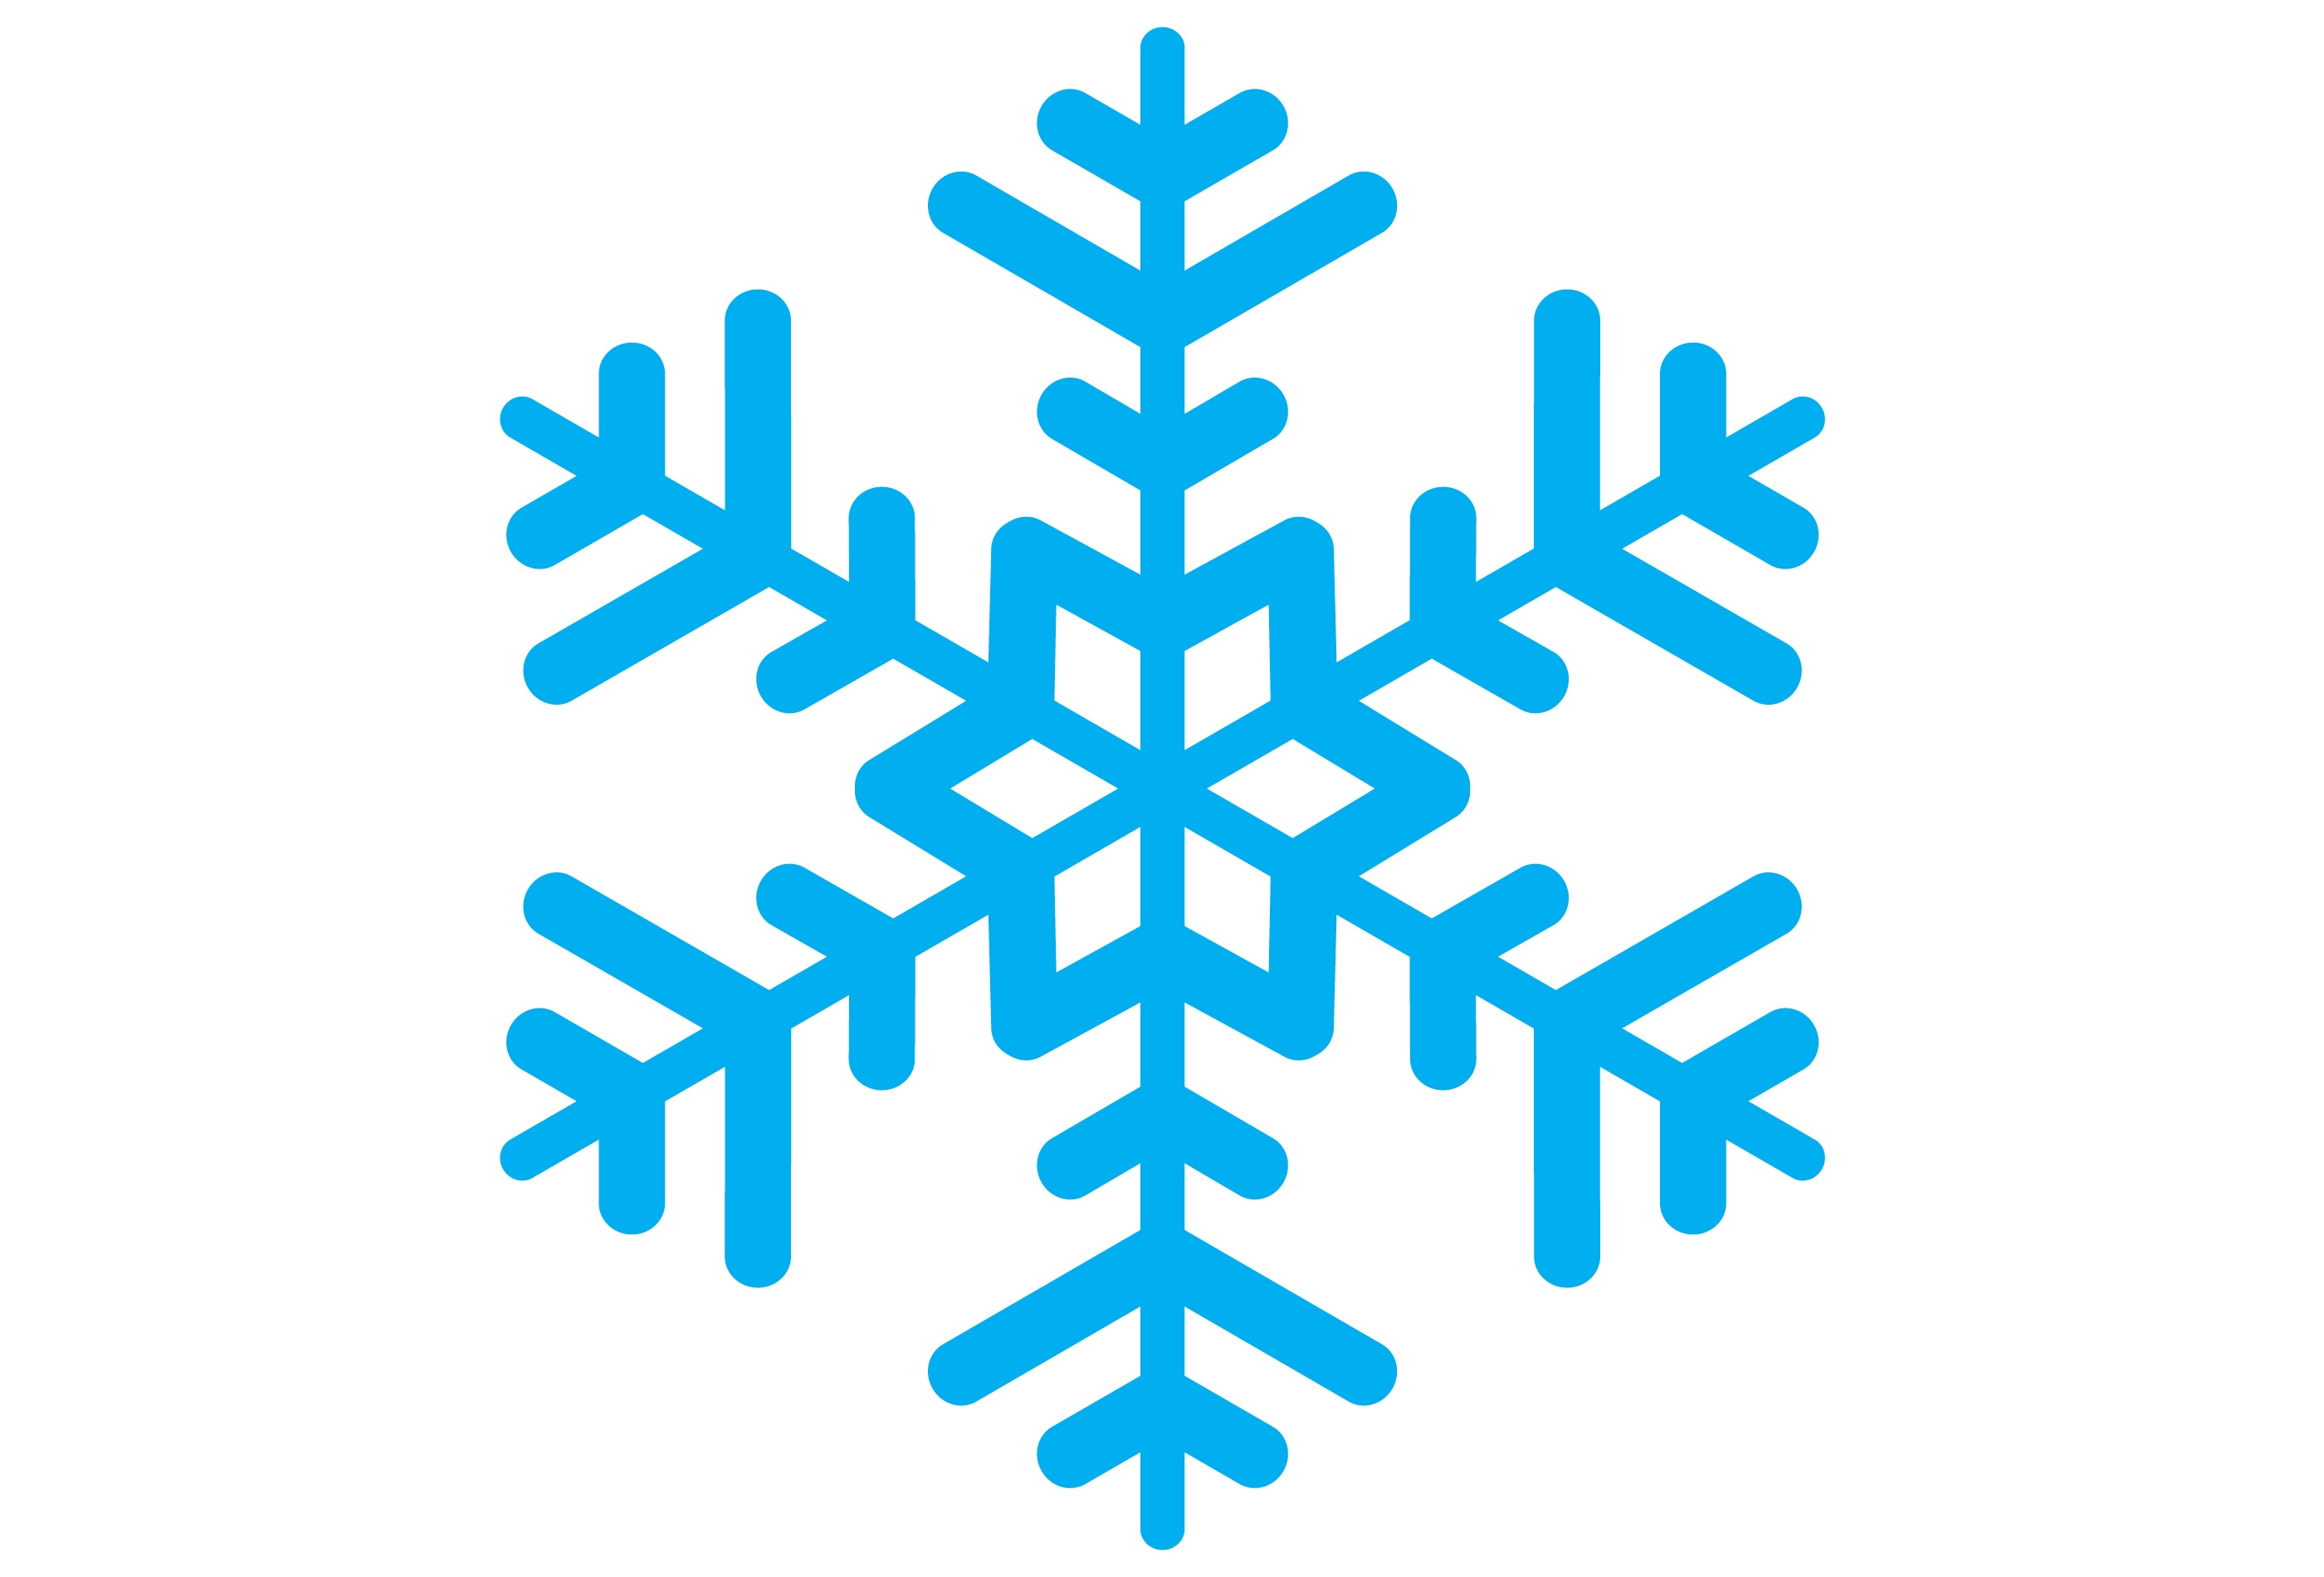 2800x1900 Snow Flakes Clipart Snowflake Clipart Simple Snowflake 20